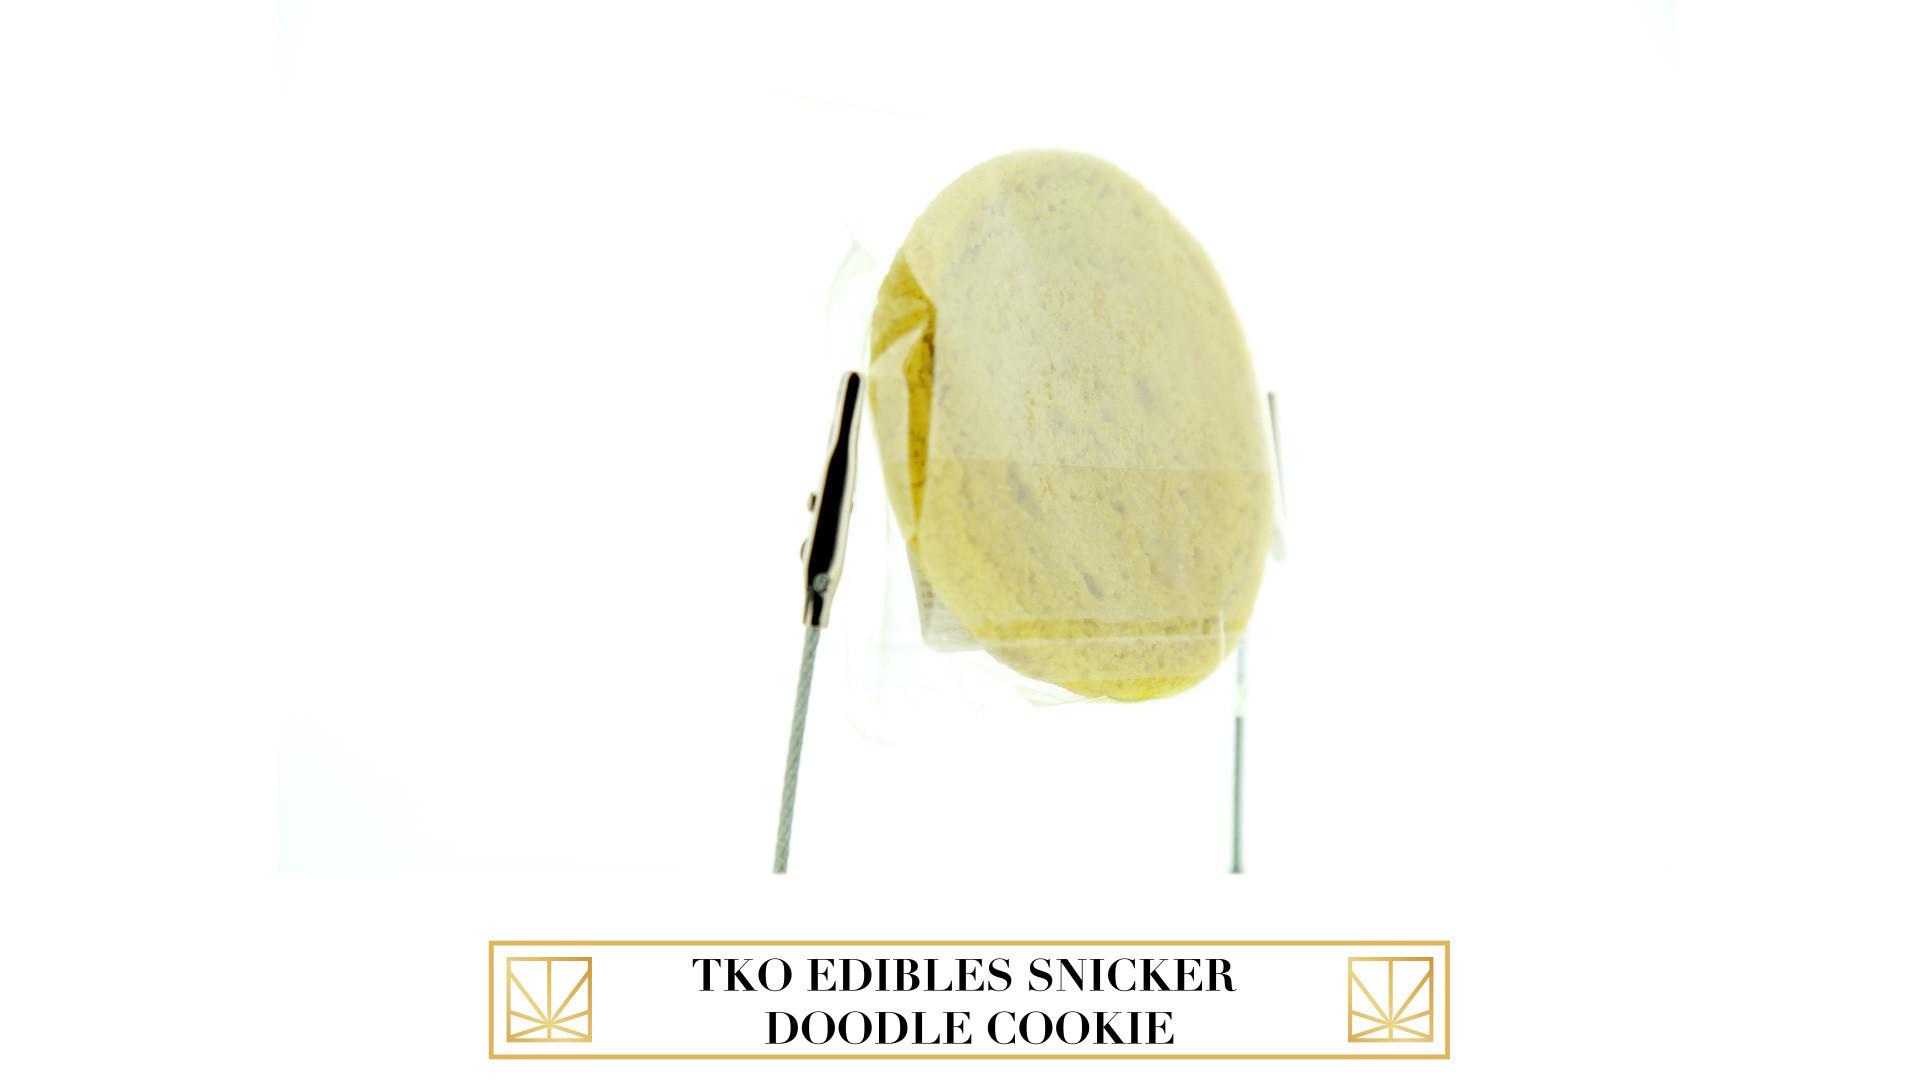 TKO Edibles Snickerdoodle Cookie